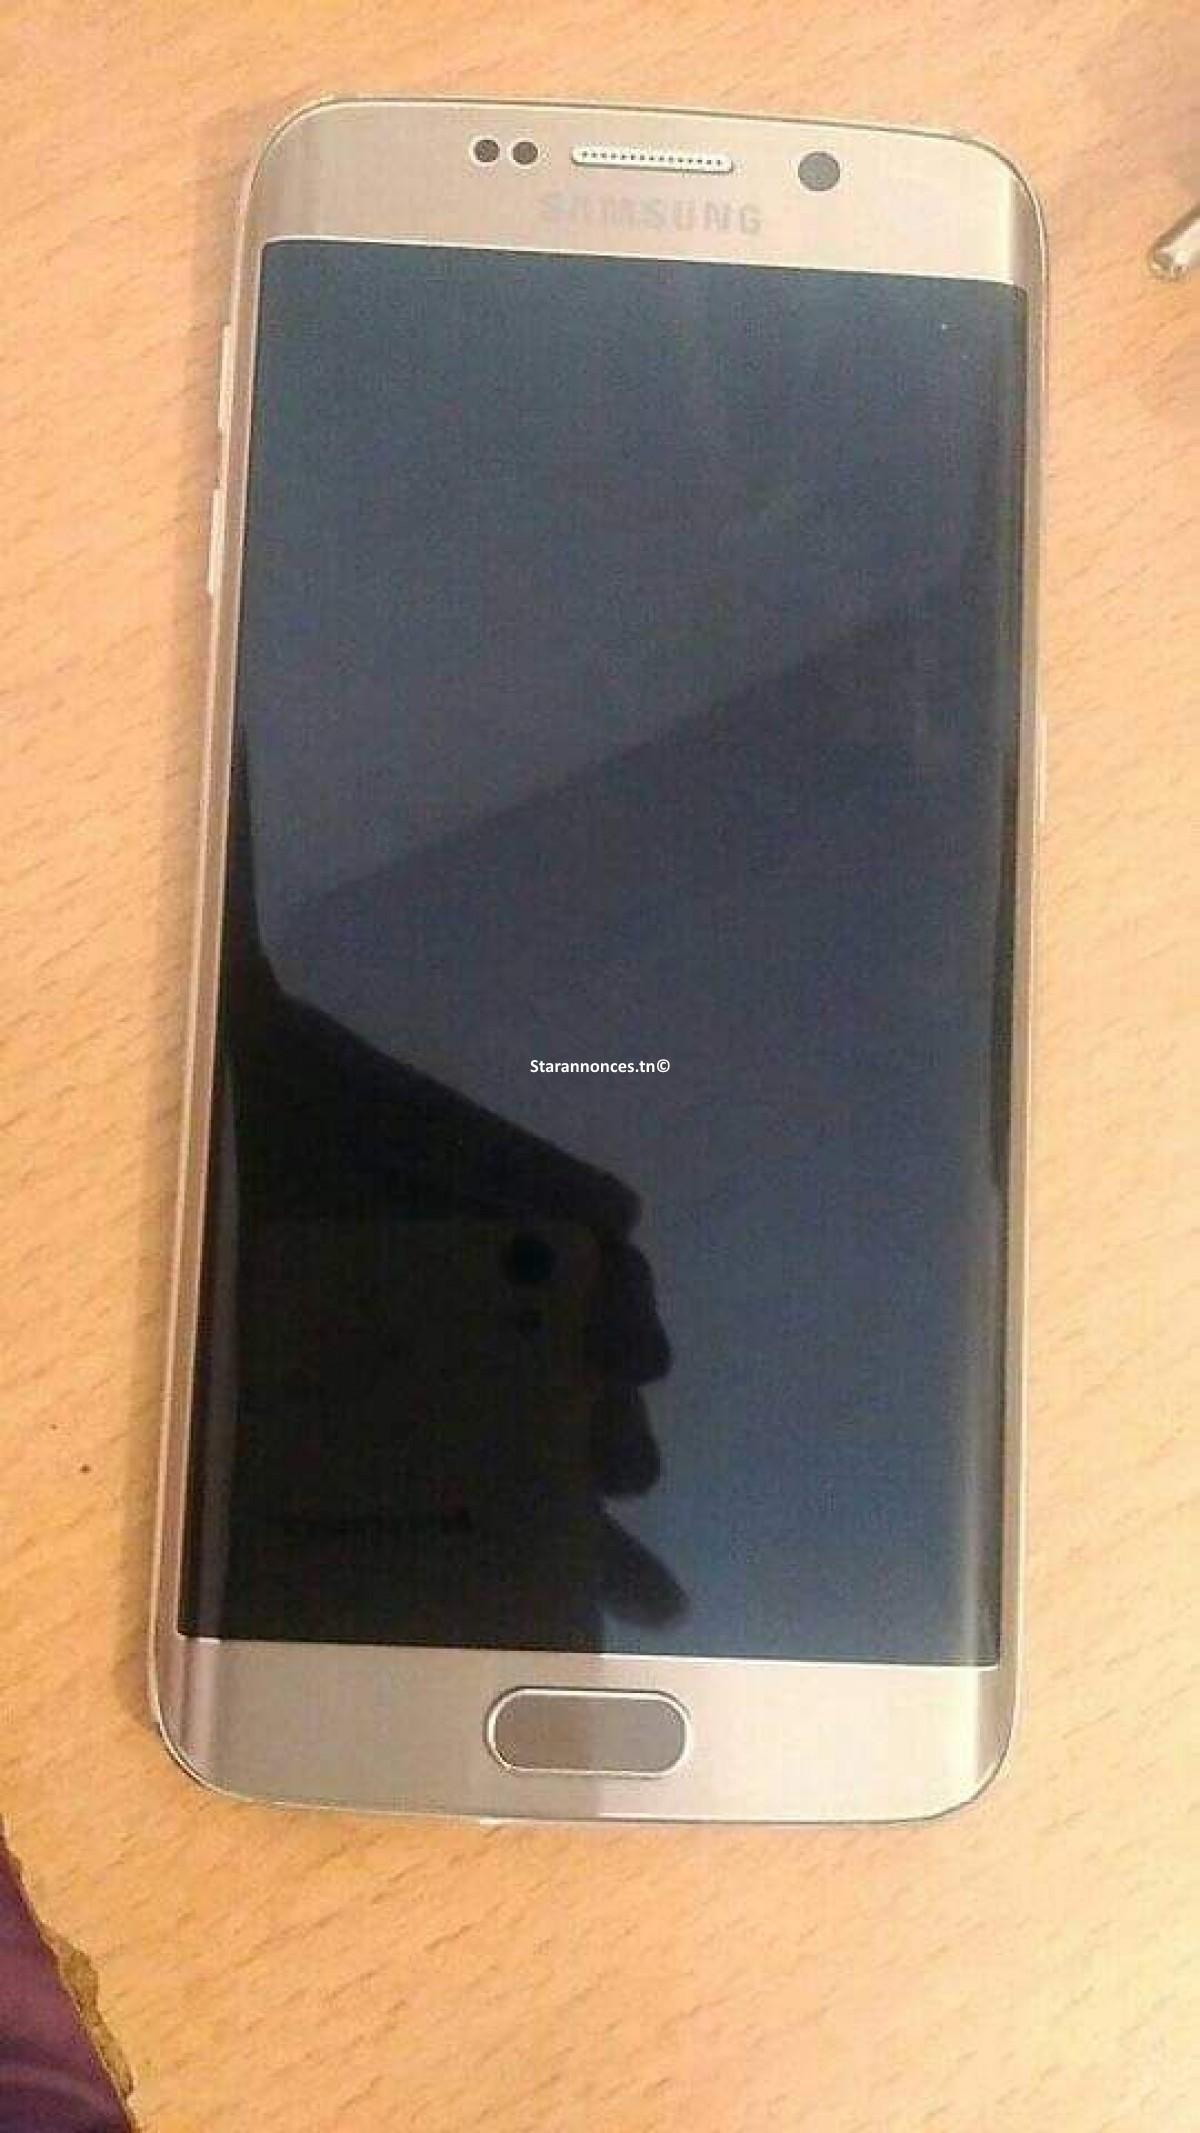 Samsung S6 Edge Sagem Ariana Grand Tunis Starannonces Tn